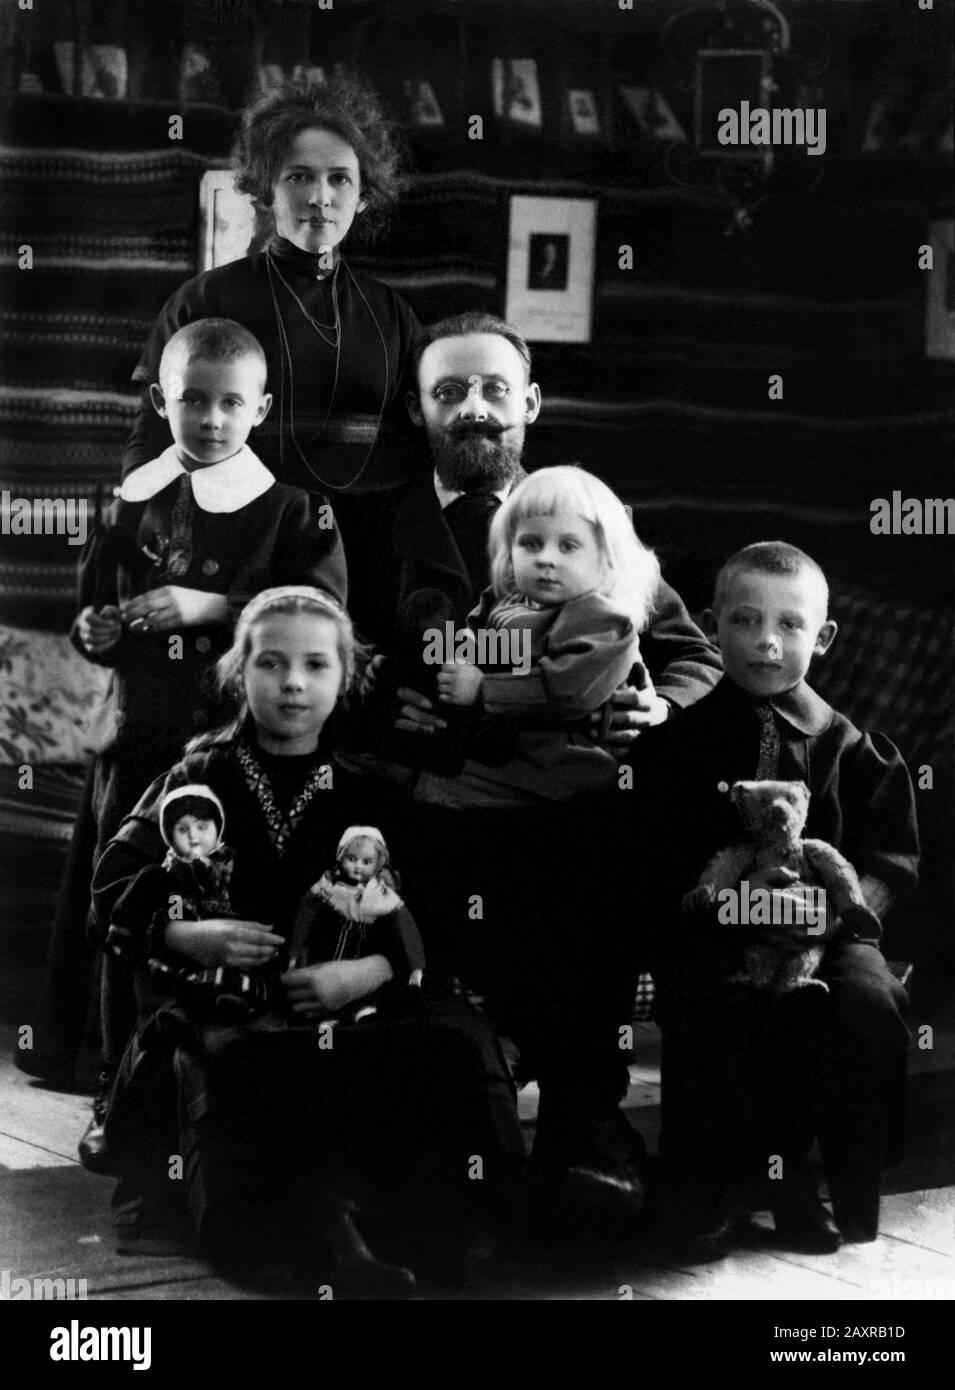 1900 ca ,Storgarden , Brunnsvik on Lake Vasman, LUDVIKA, SWEDEN : The swedish writer and Social Democratic politician Doctor KARL-ERIK FORSSLUND ( 1872 - 1941 ) with wife FEJAN at home with the four sons: MARJO , JORAN , KARL-HERMAN and MAJA  . - LETTERATO - SCRITTORE - LETTERATURA - Literature - occhiali da vista - lens - foto gruppo di FAMIGLIA - FAMILY - beard - barba - SVEZIA  - toys - toy - giocattolo - giocattoli - Teddy Bear - orsachiotto - figli - figlio - figlia - daughter - son - fratelli - brothers - moglie - mamma - mother - NATALE - CHRISTMAS TIME - festa natalizia - XMAS - bambol Stock Photo